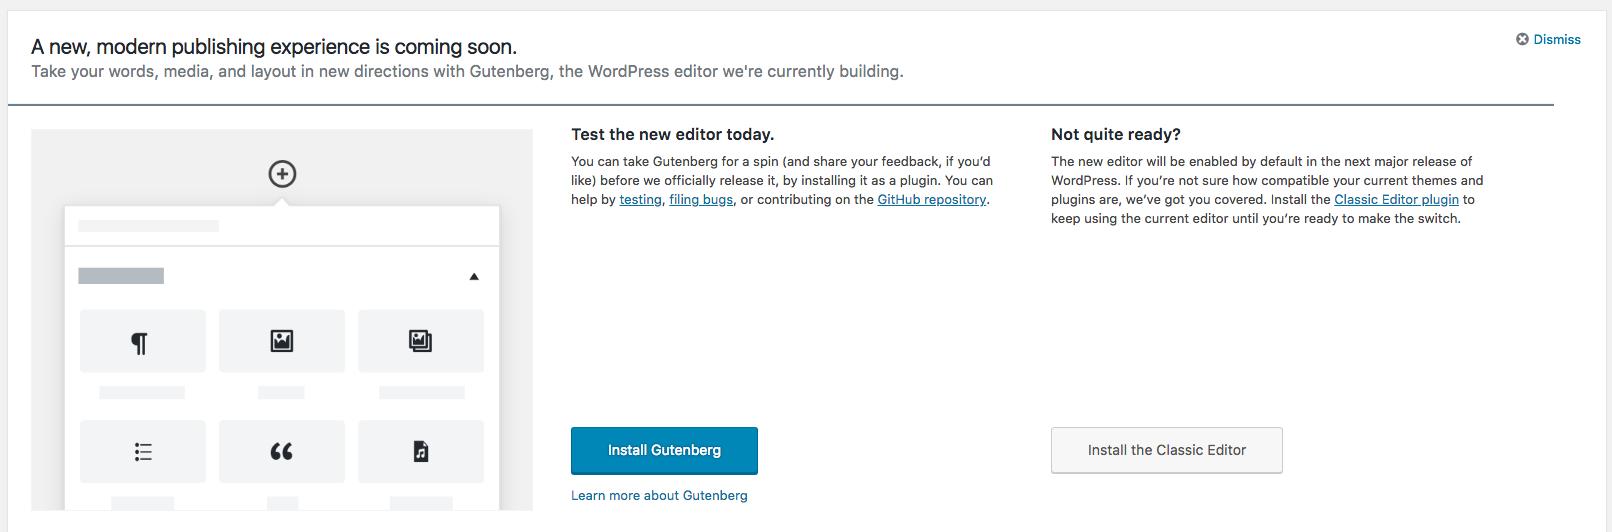 Gutenberg Project view in WordPress Dashboard